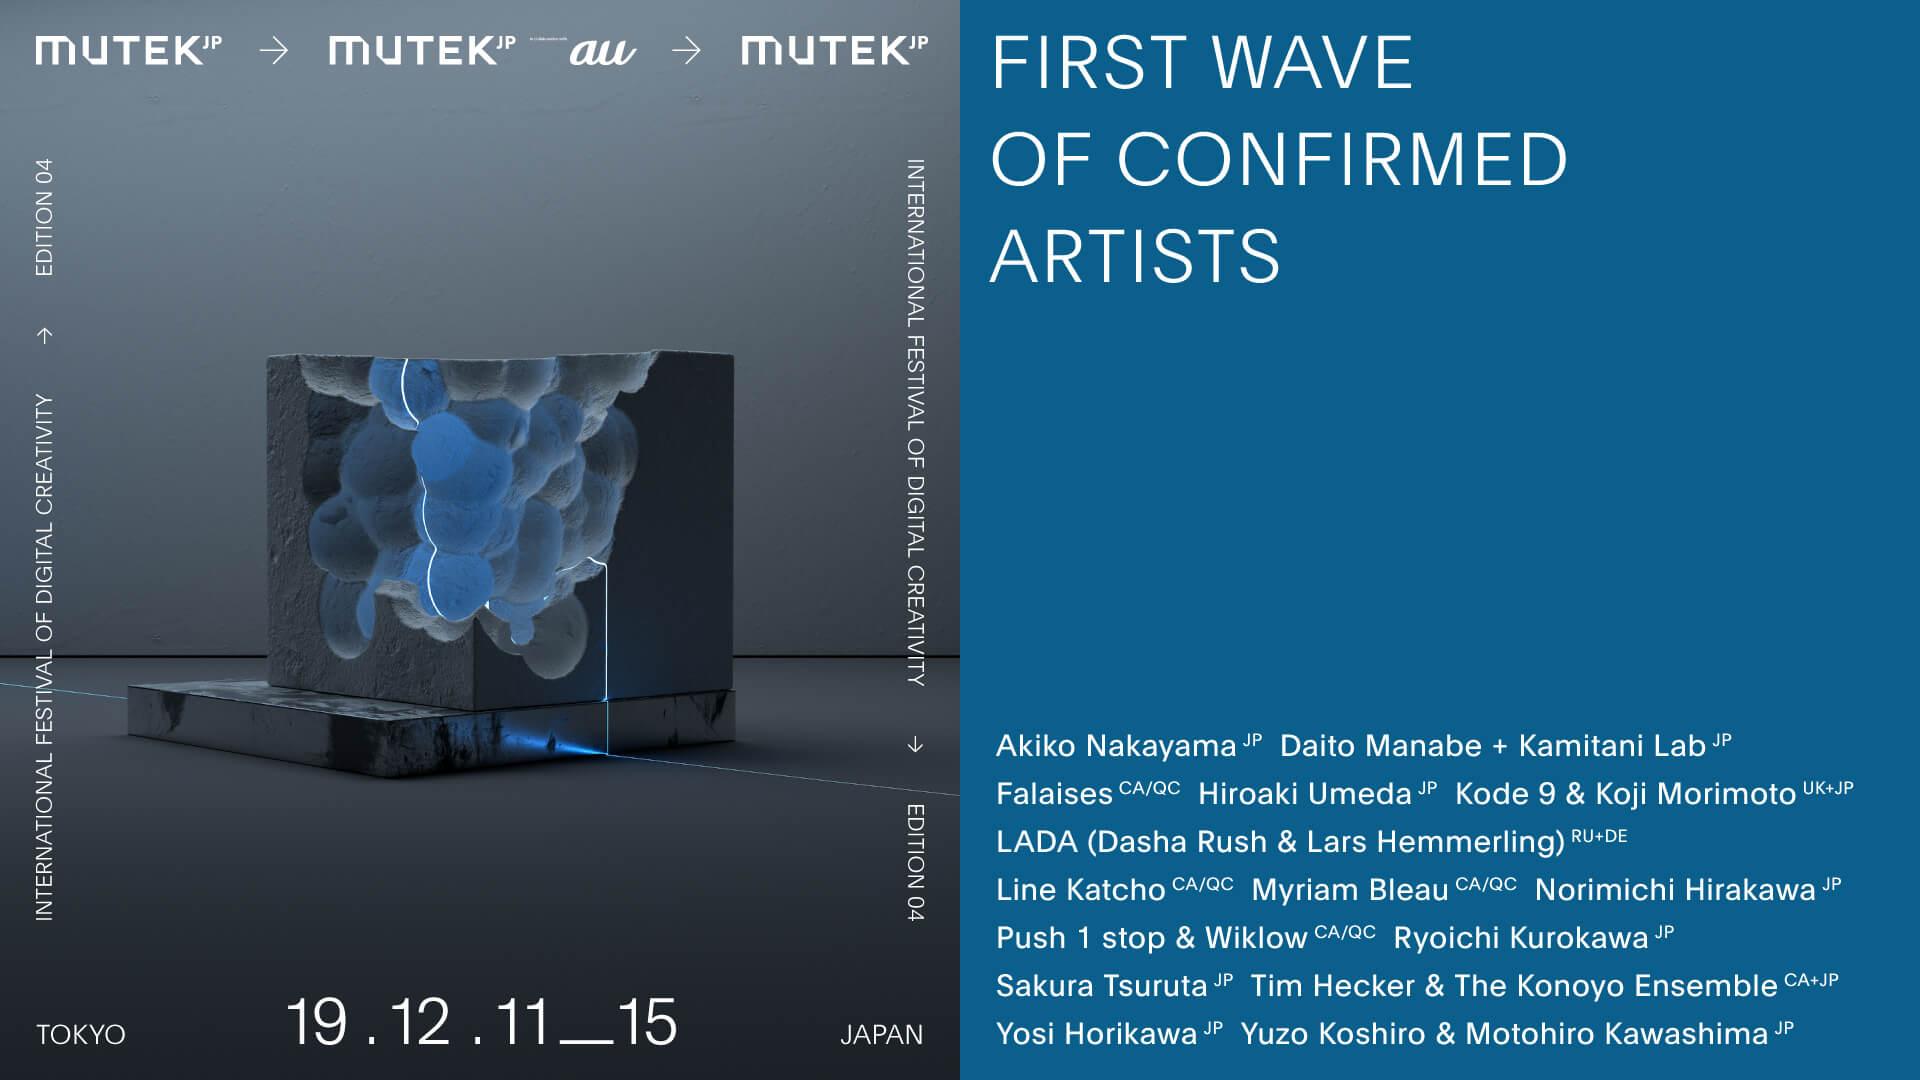 <MUTEK.JP 2019>の第一弾ラインアップにKode9&森本晃司、Tim Hecker、真鍋大度、中山晃子らが発表 music190926-mutek-1-3